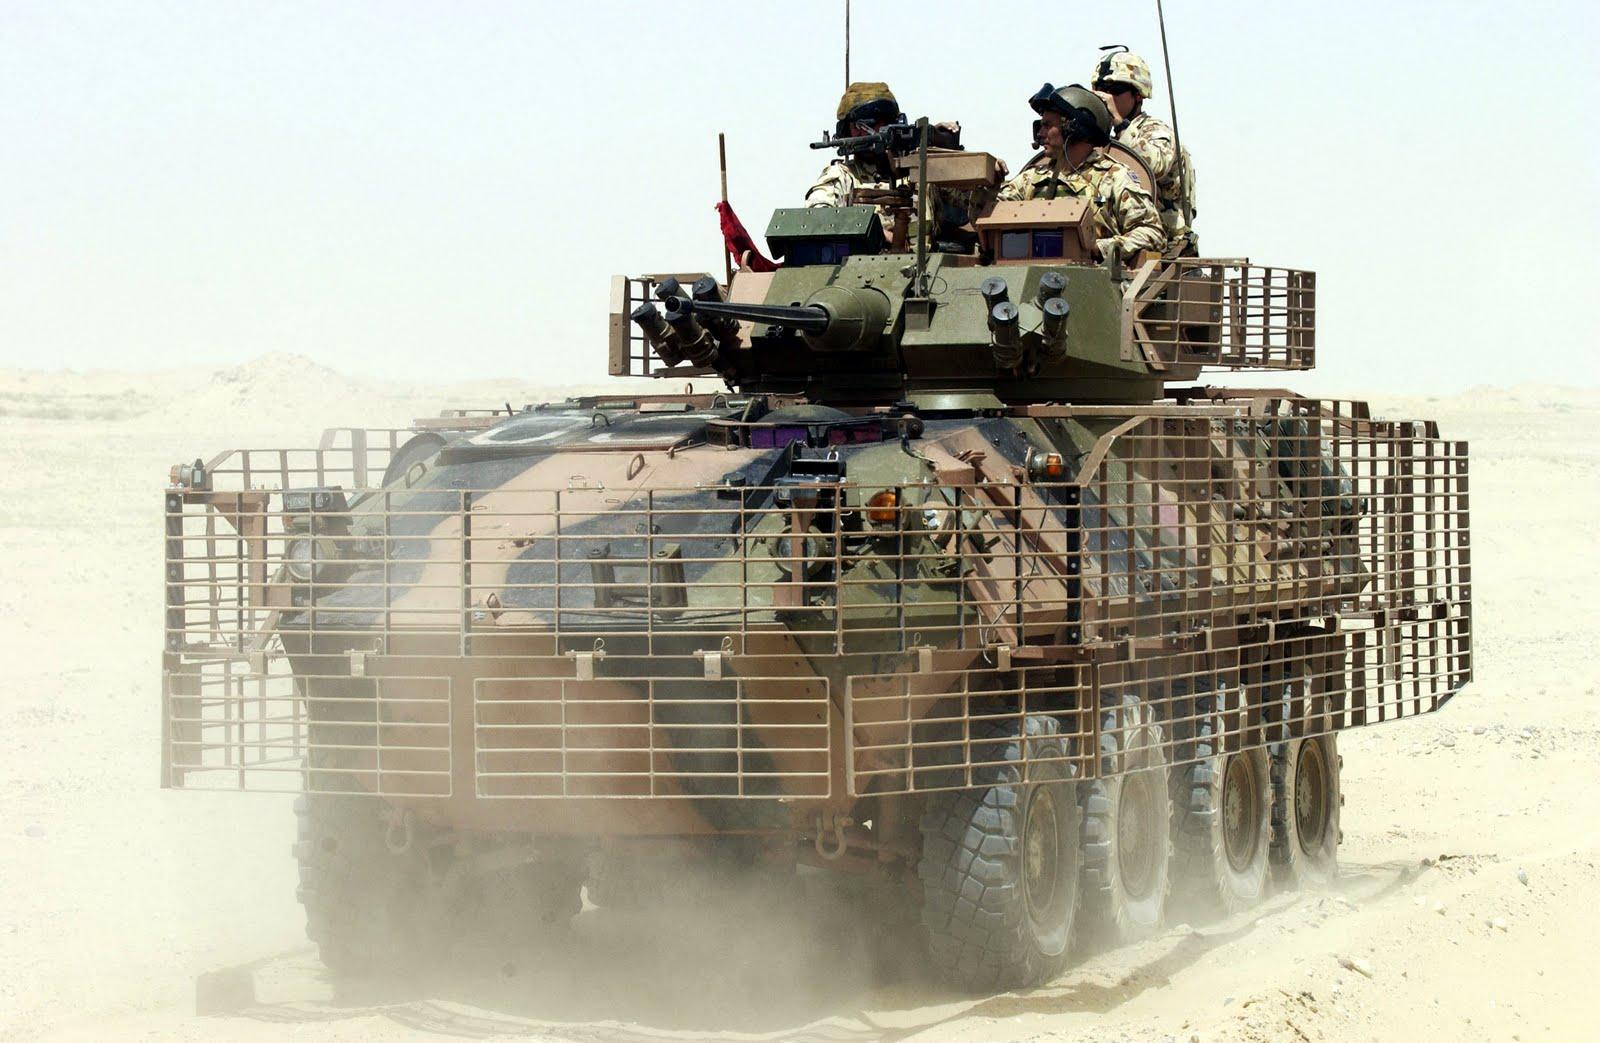 http://4.bp.blogspot.com/_Jx0sqzELZiE/TIj5cyVujUI/AAAAAAAAAHo/mf-vUOqi-4Y/s1600/Tanks%2B(4).jpg